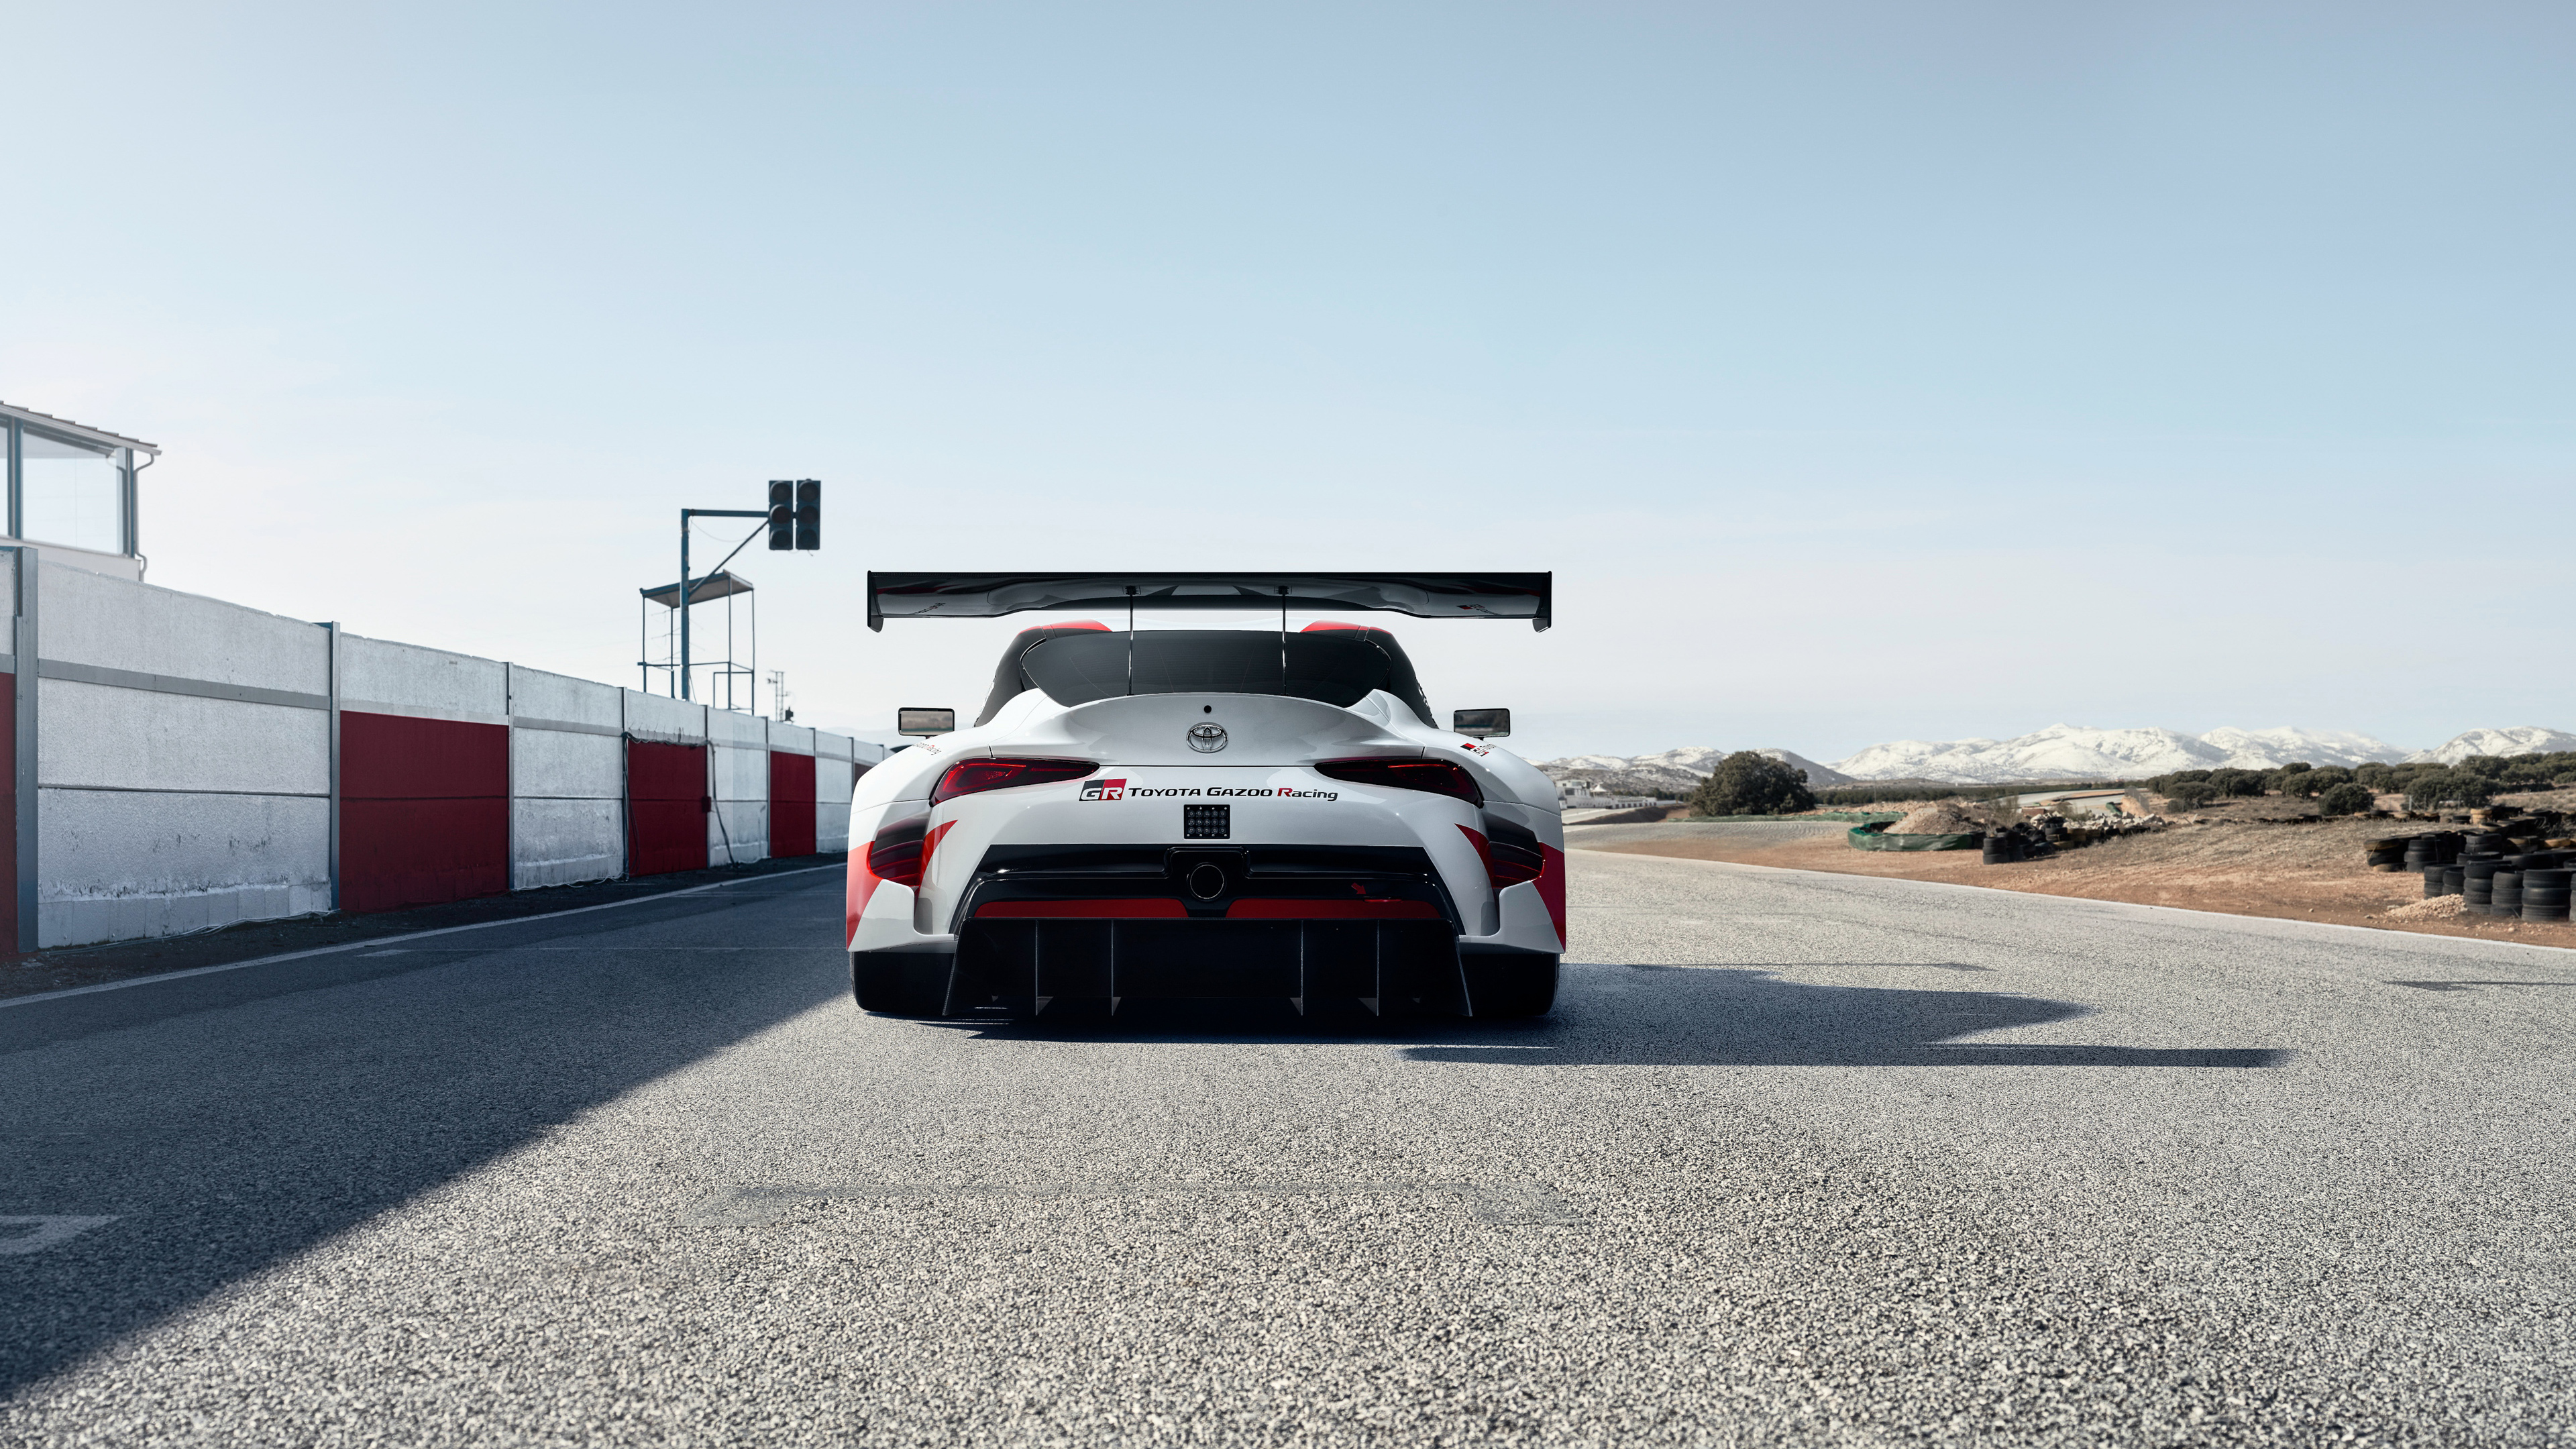 2018 Toyota Gr Supra Racing Concept 4k 7 Wallpaper Hd